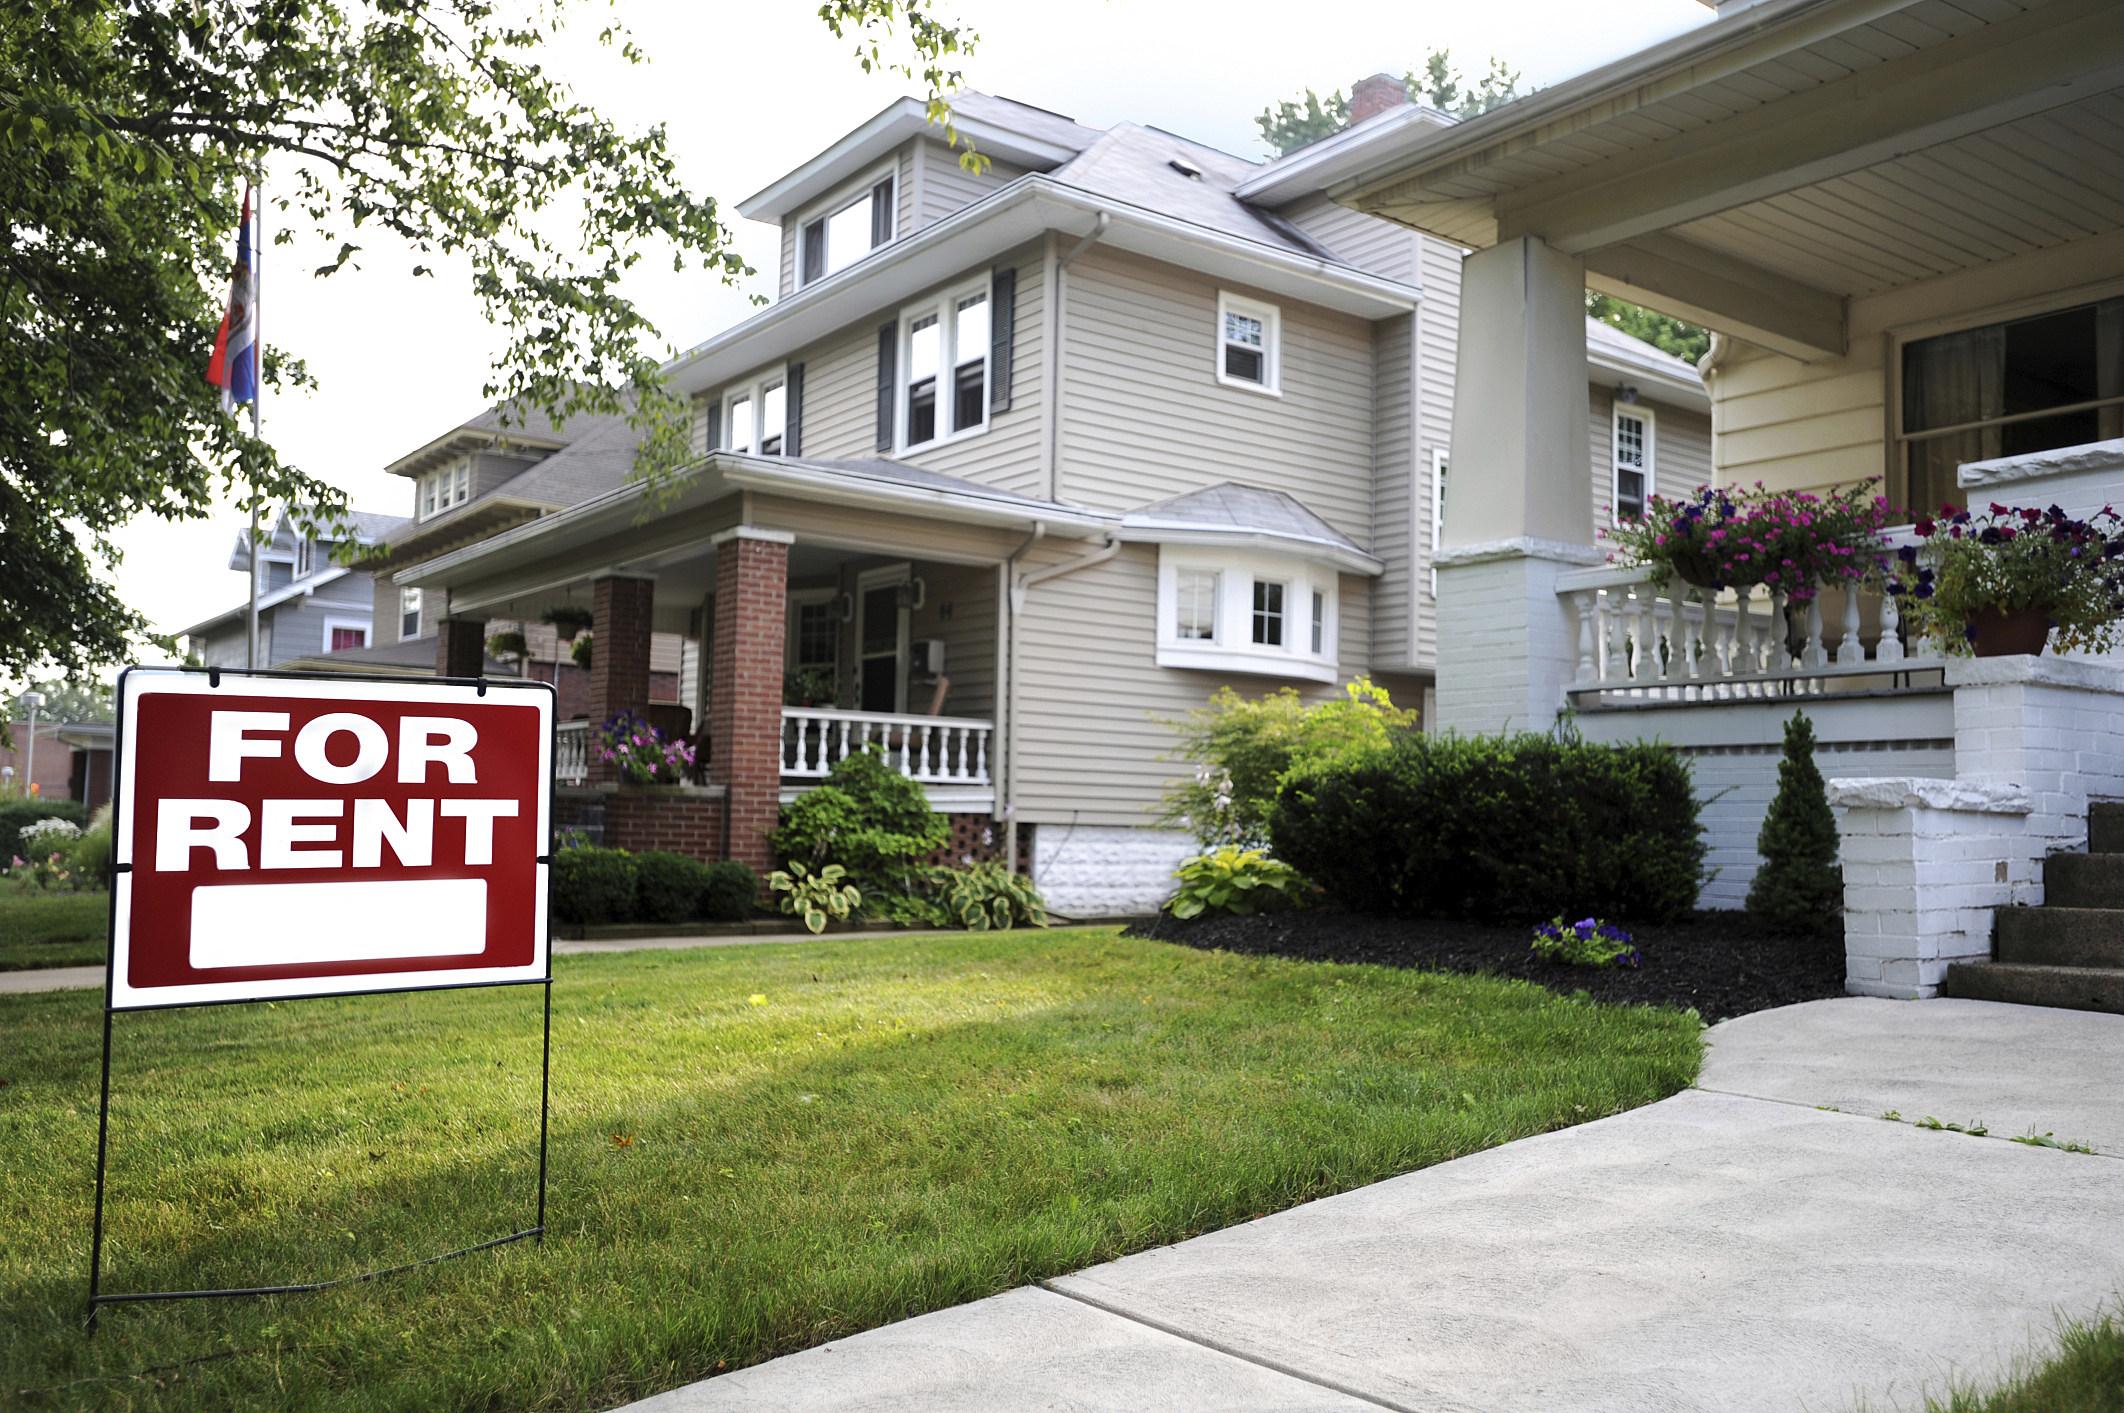 Renting in Grand Junction: One Man's Nightmare